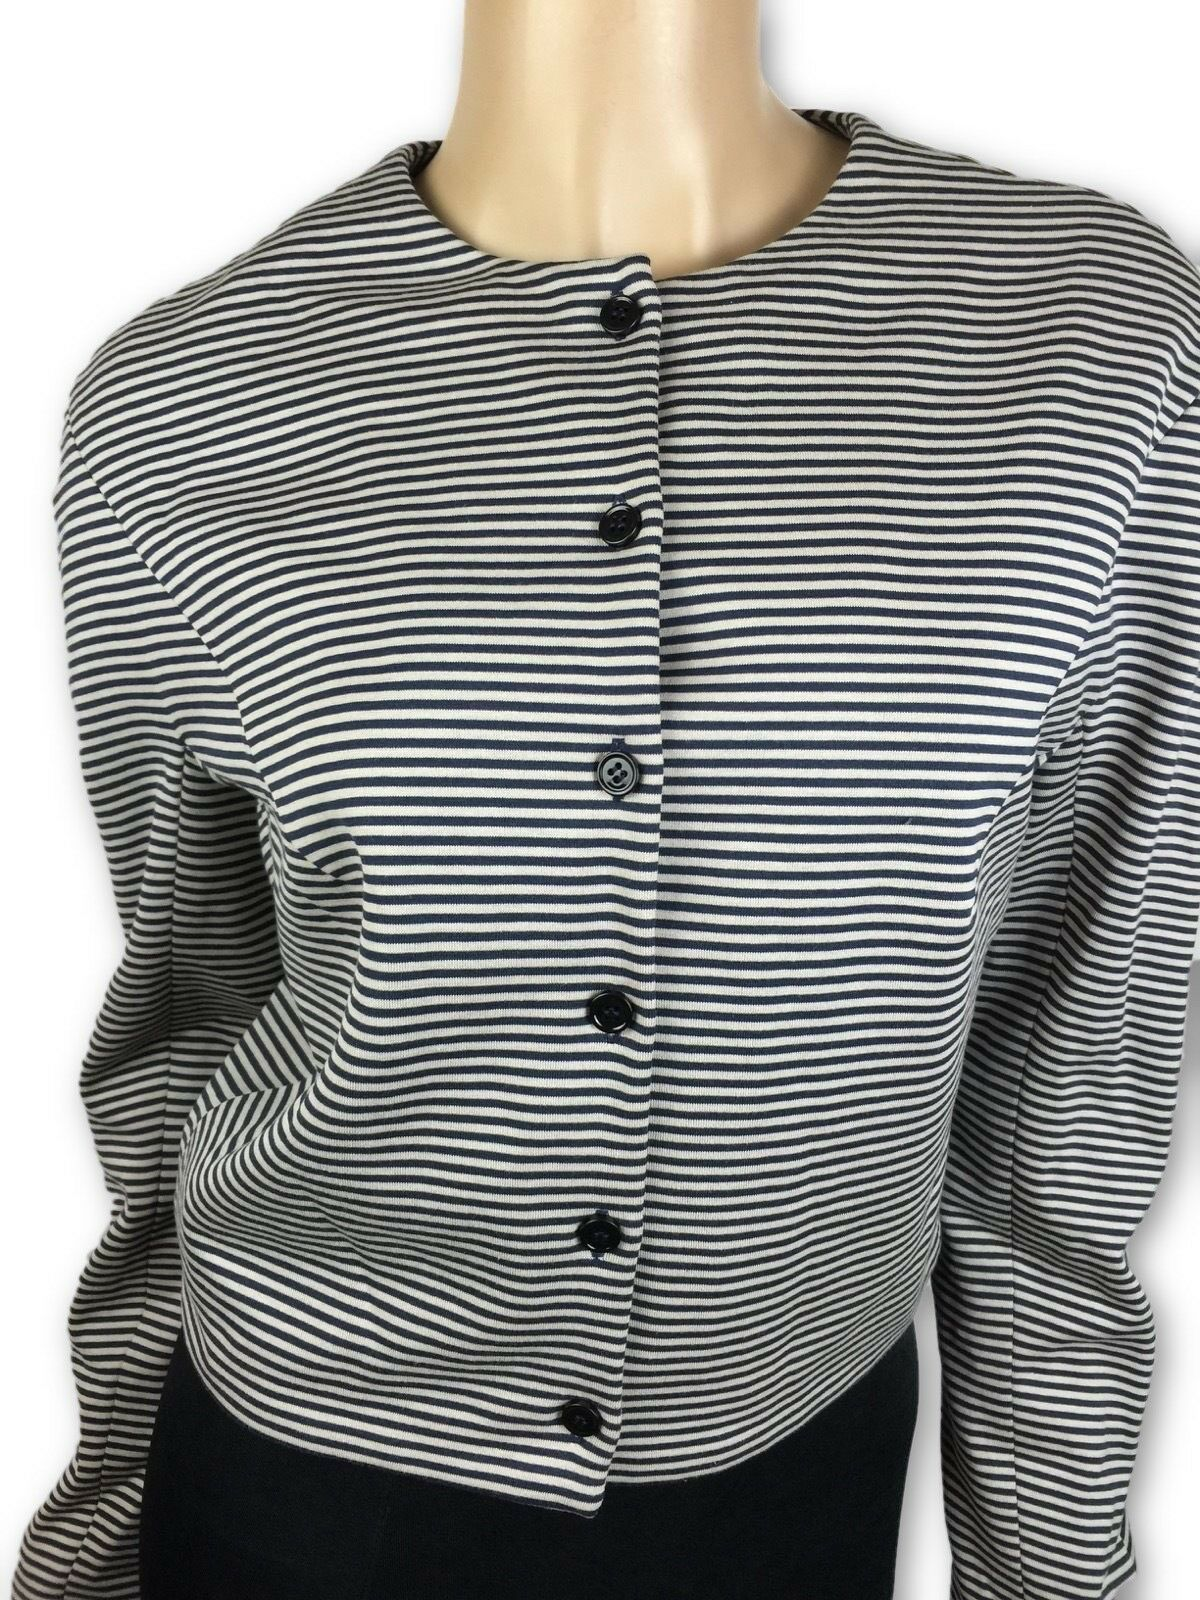 Carven New Top Jacket schwarz & braun Stripes US 10 Long Sleeves MSRP